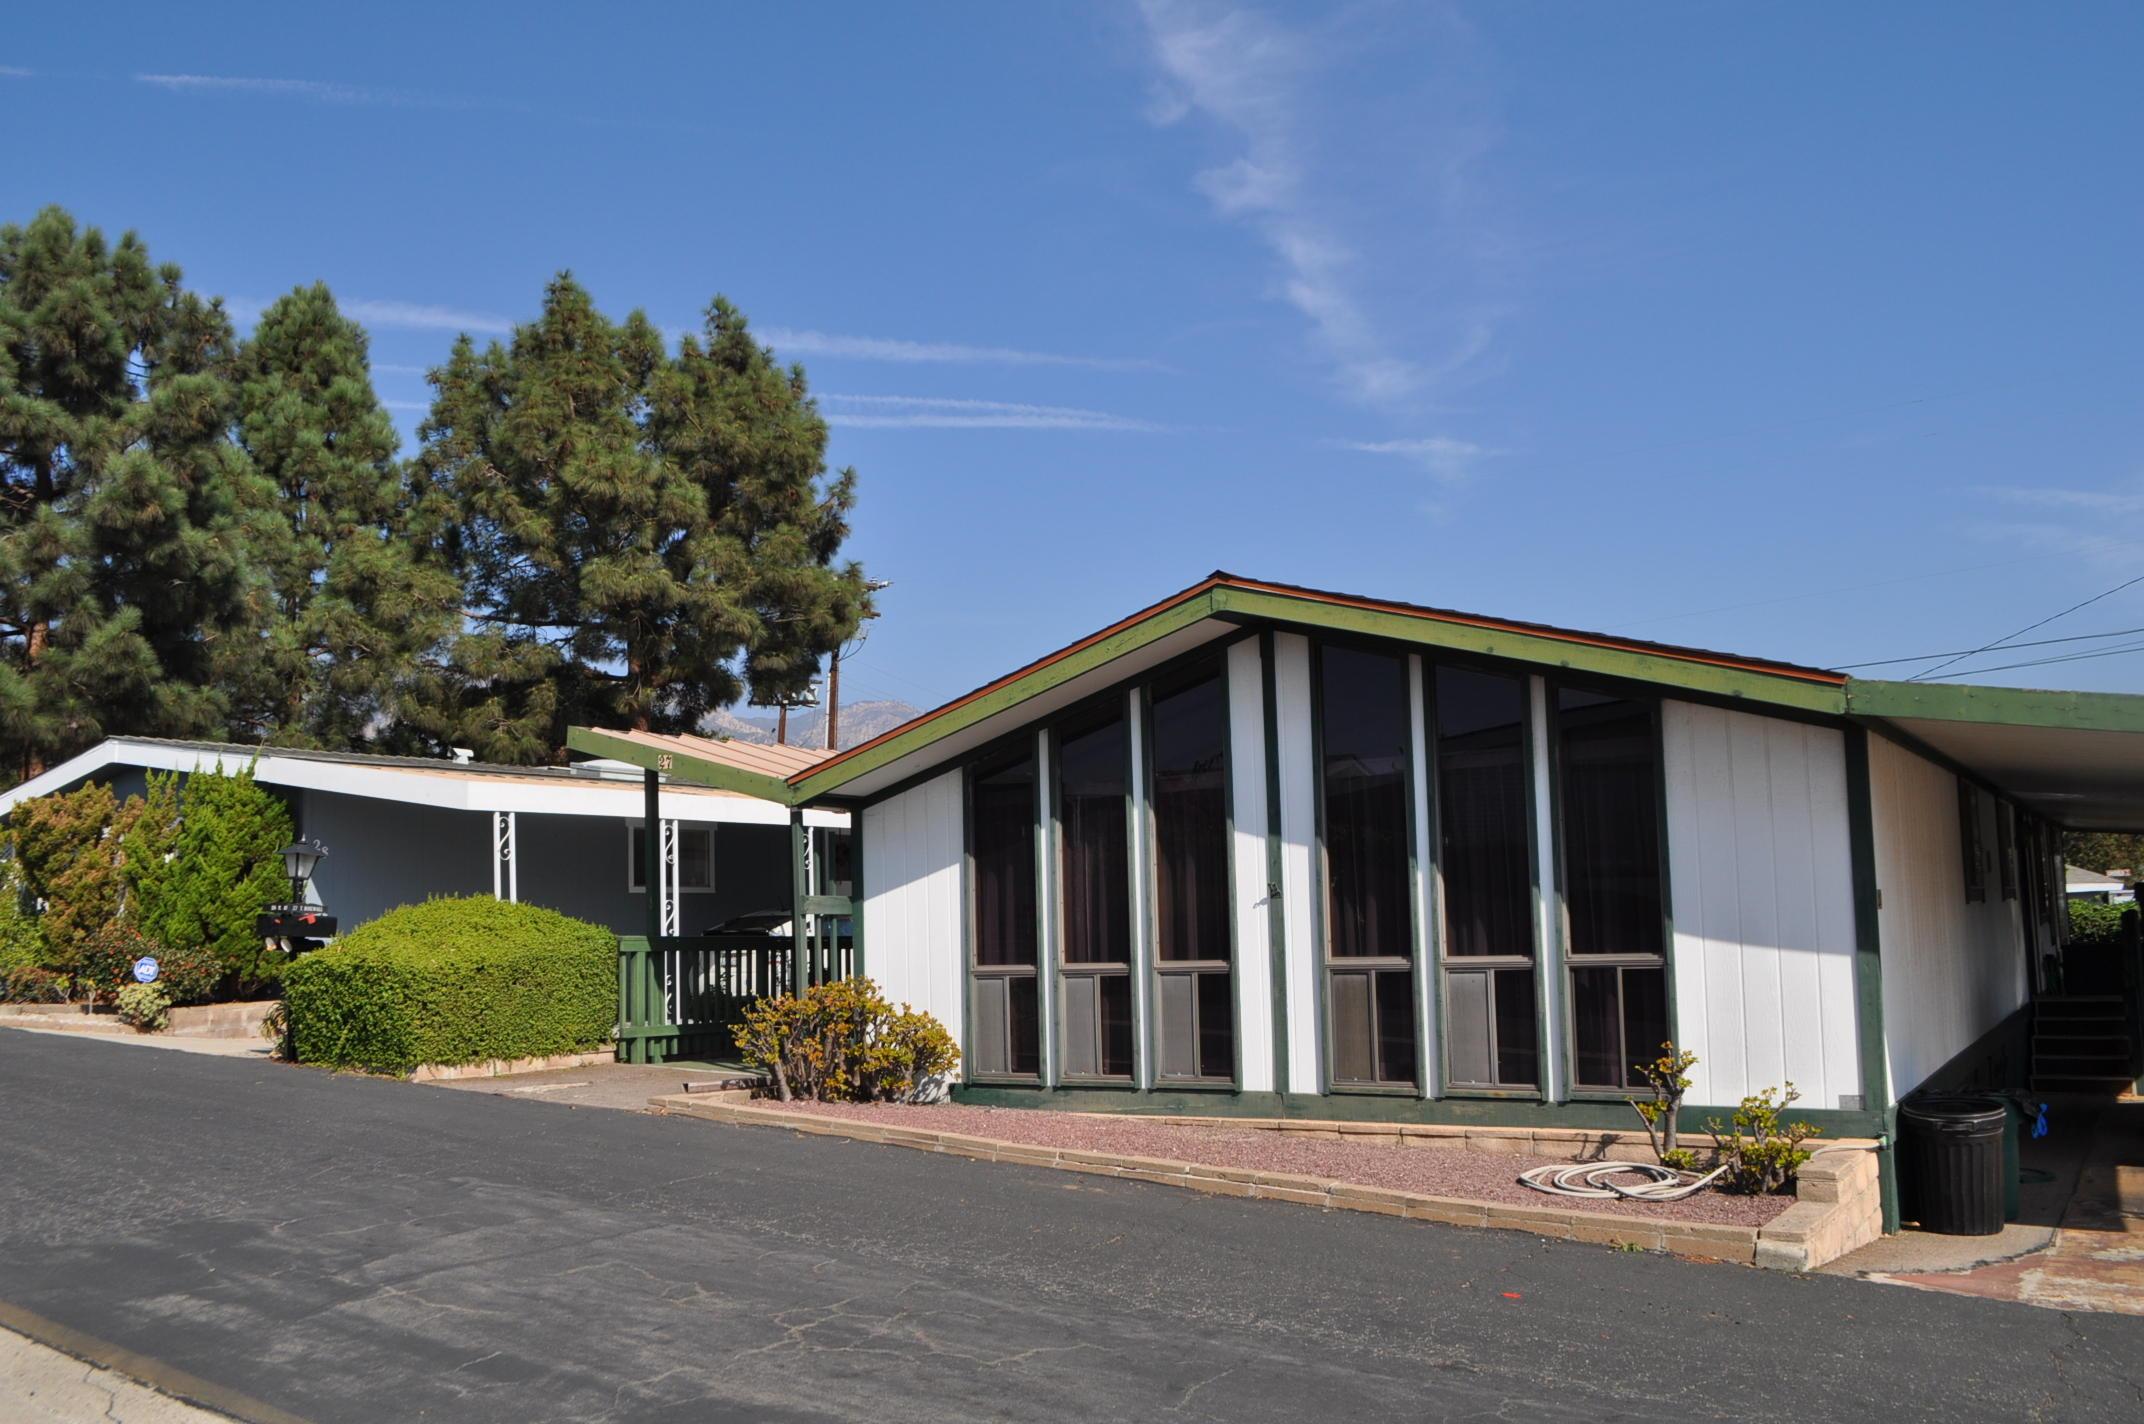 Property photo for 340 Old Mill Rd #27 Santa Barbara, California 93110 - 18-3825